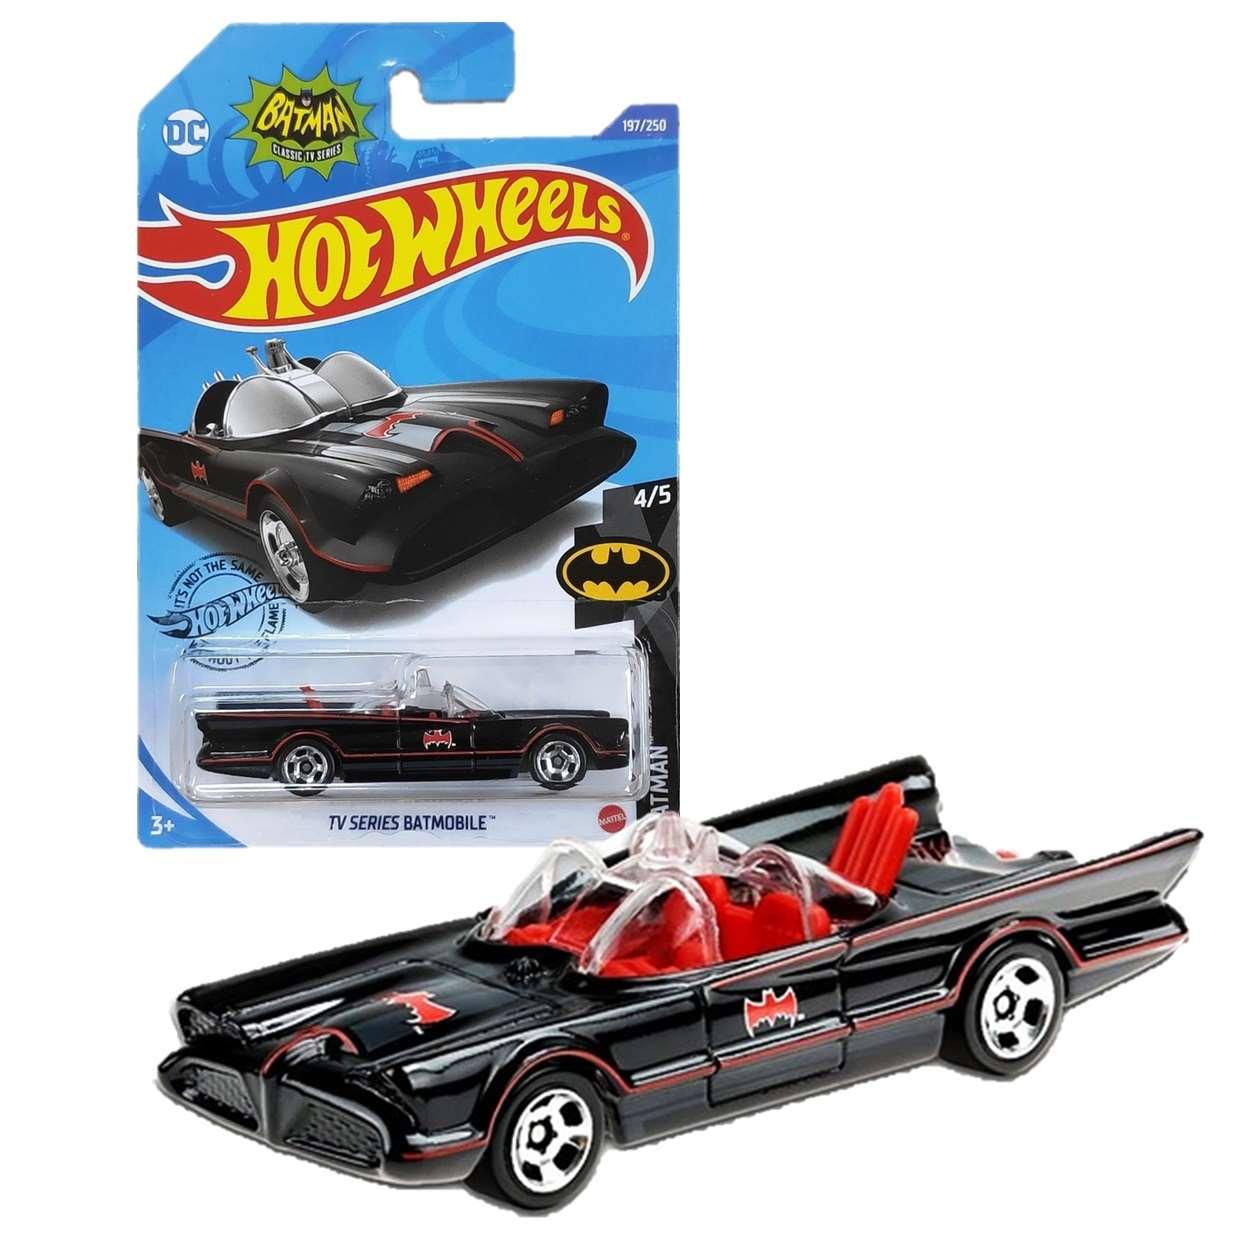 Batmobile Tv Series 4/5 Dc Comics Hot Wheels 197/250